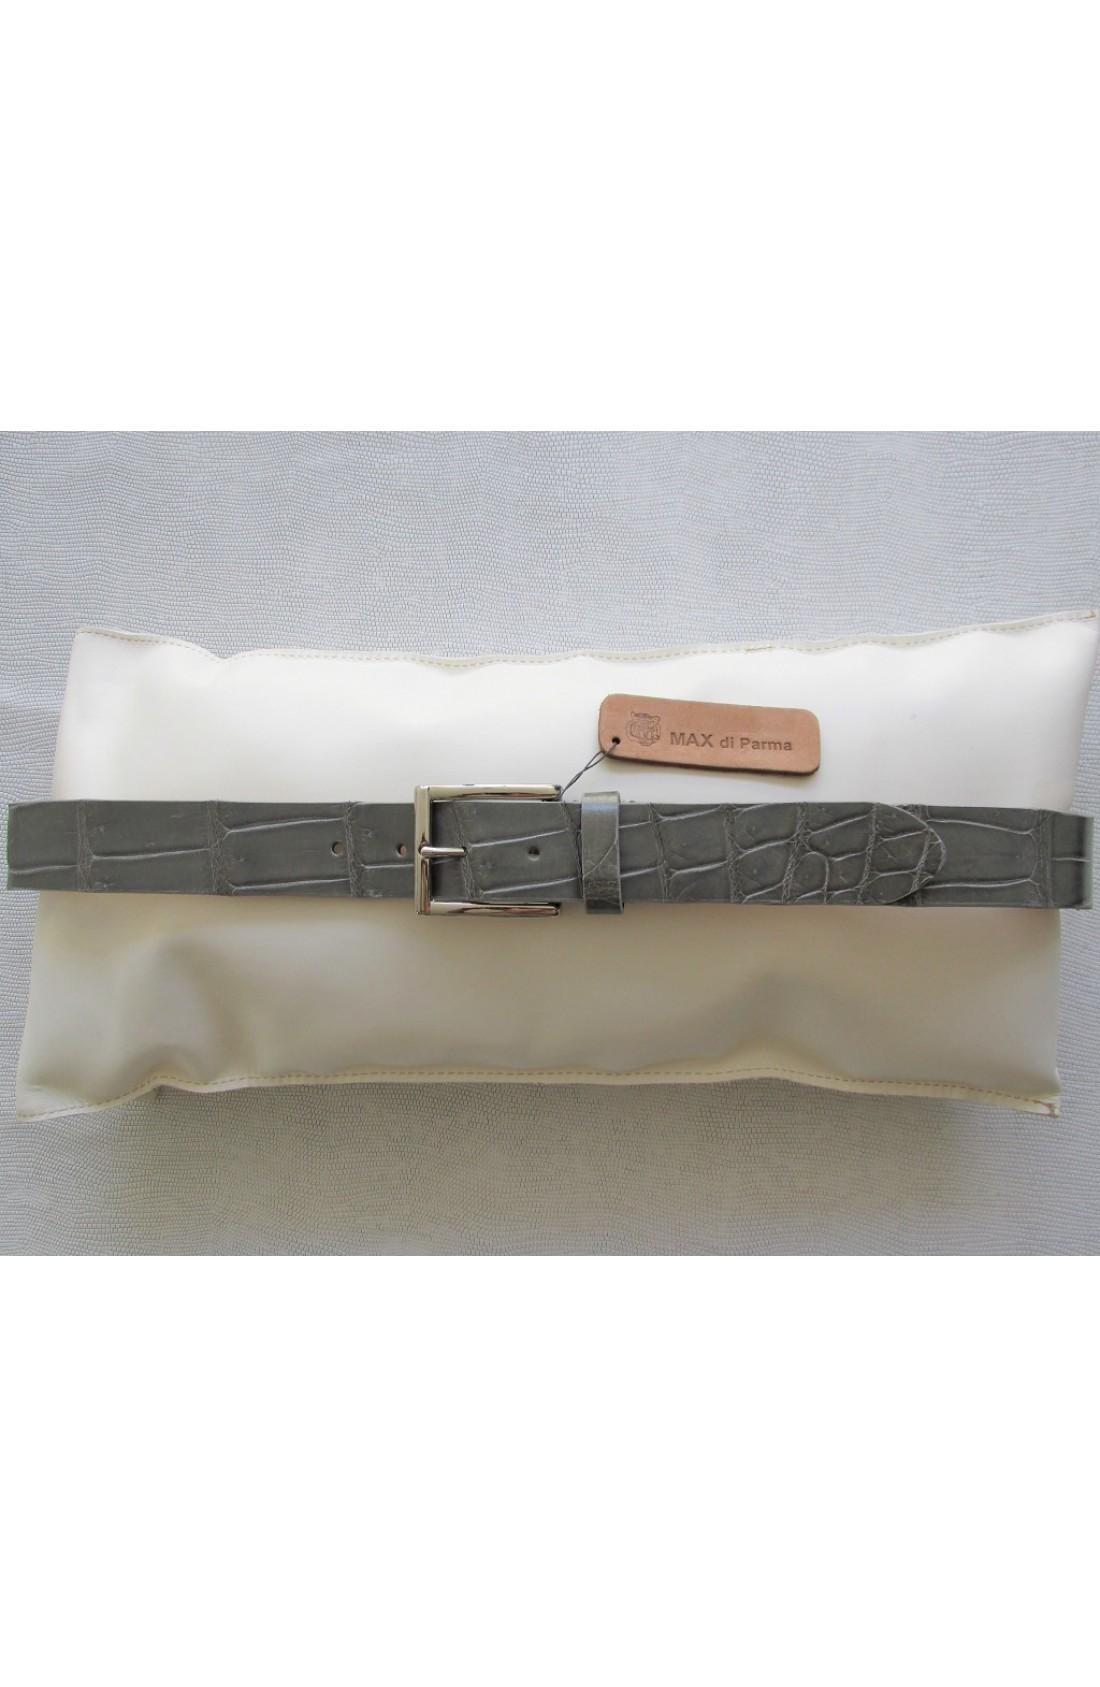 art.125 COCCODRILLO VERO pancia alligatore louisiana mm.35 var.12 grigio polvere fibbia I 113 mm.35 nikel free